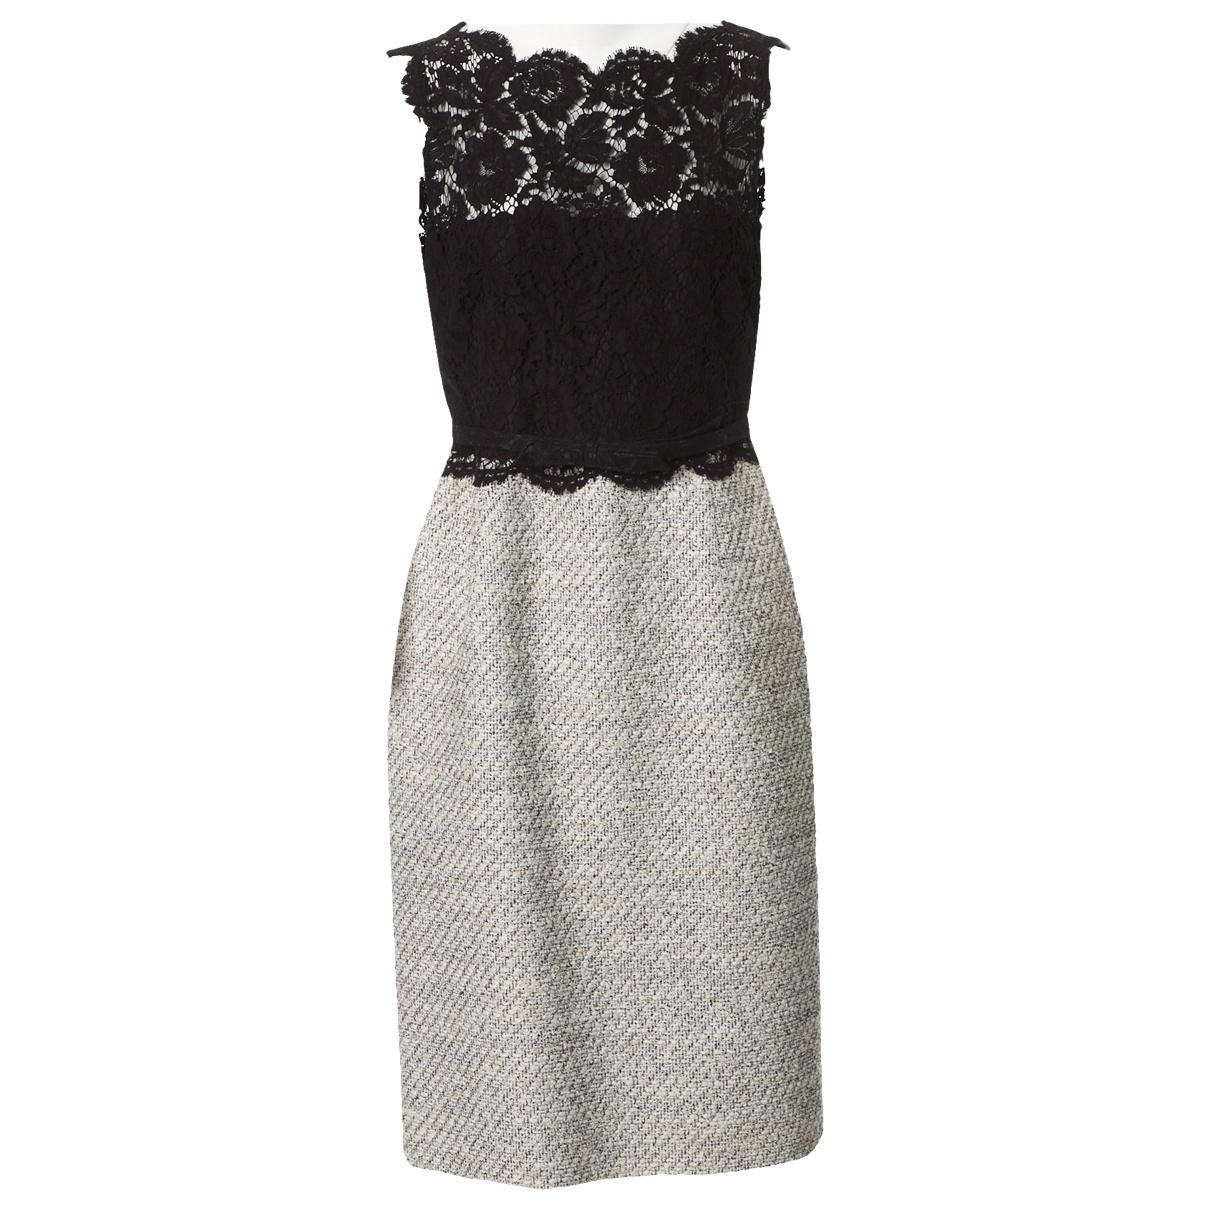 Valentino Garavani \N Black Cotton dress for Women 44 IT